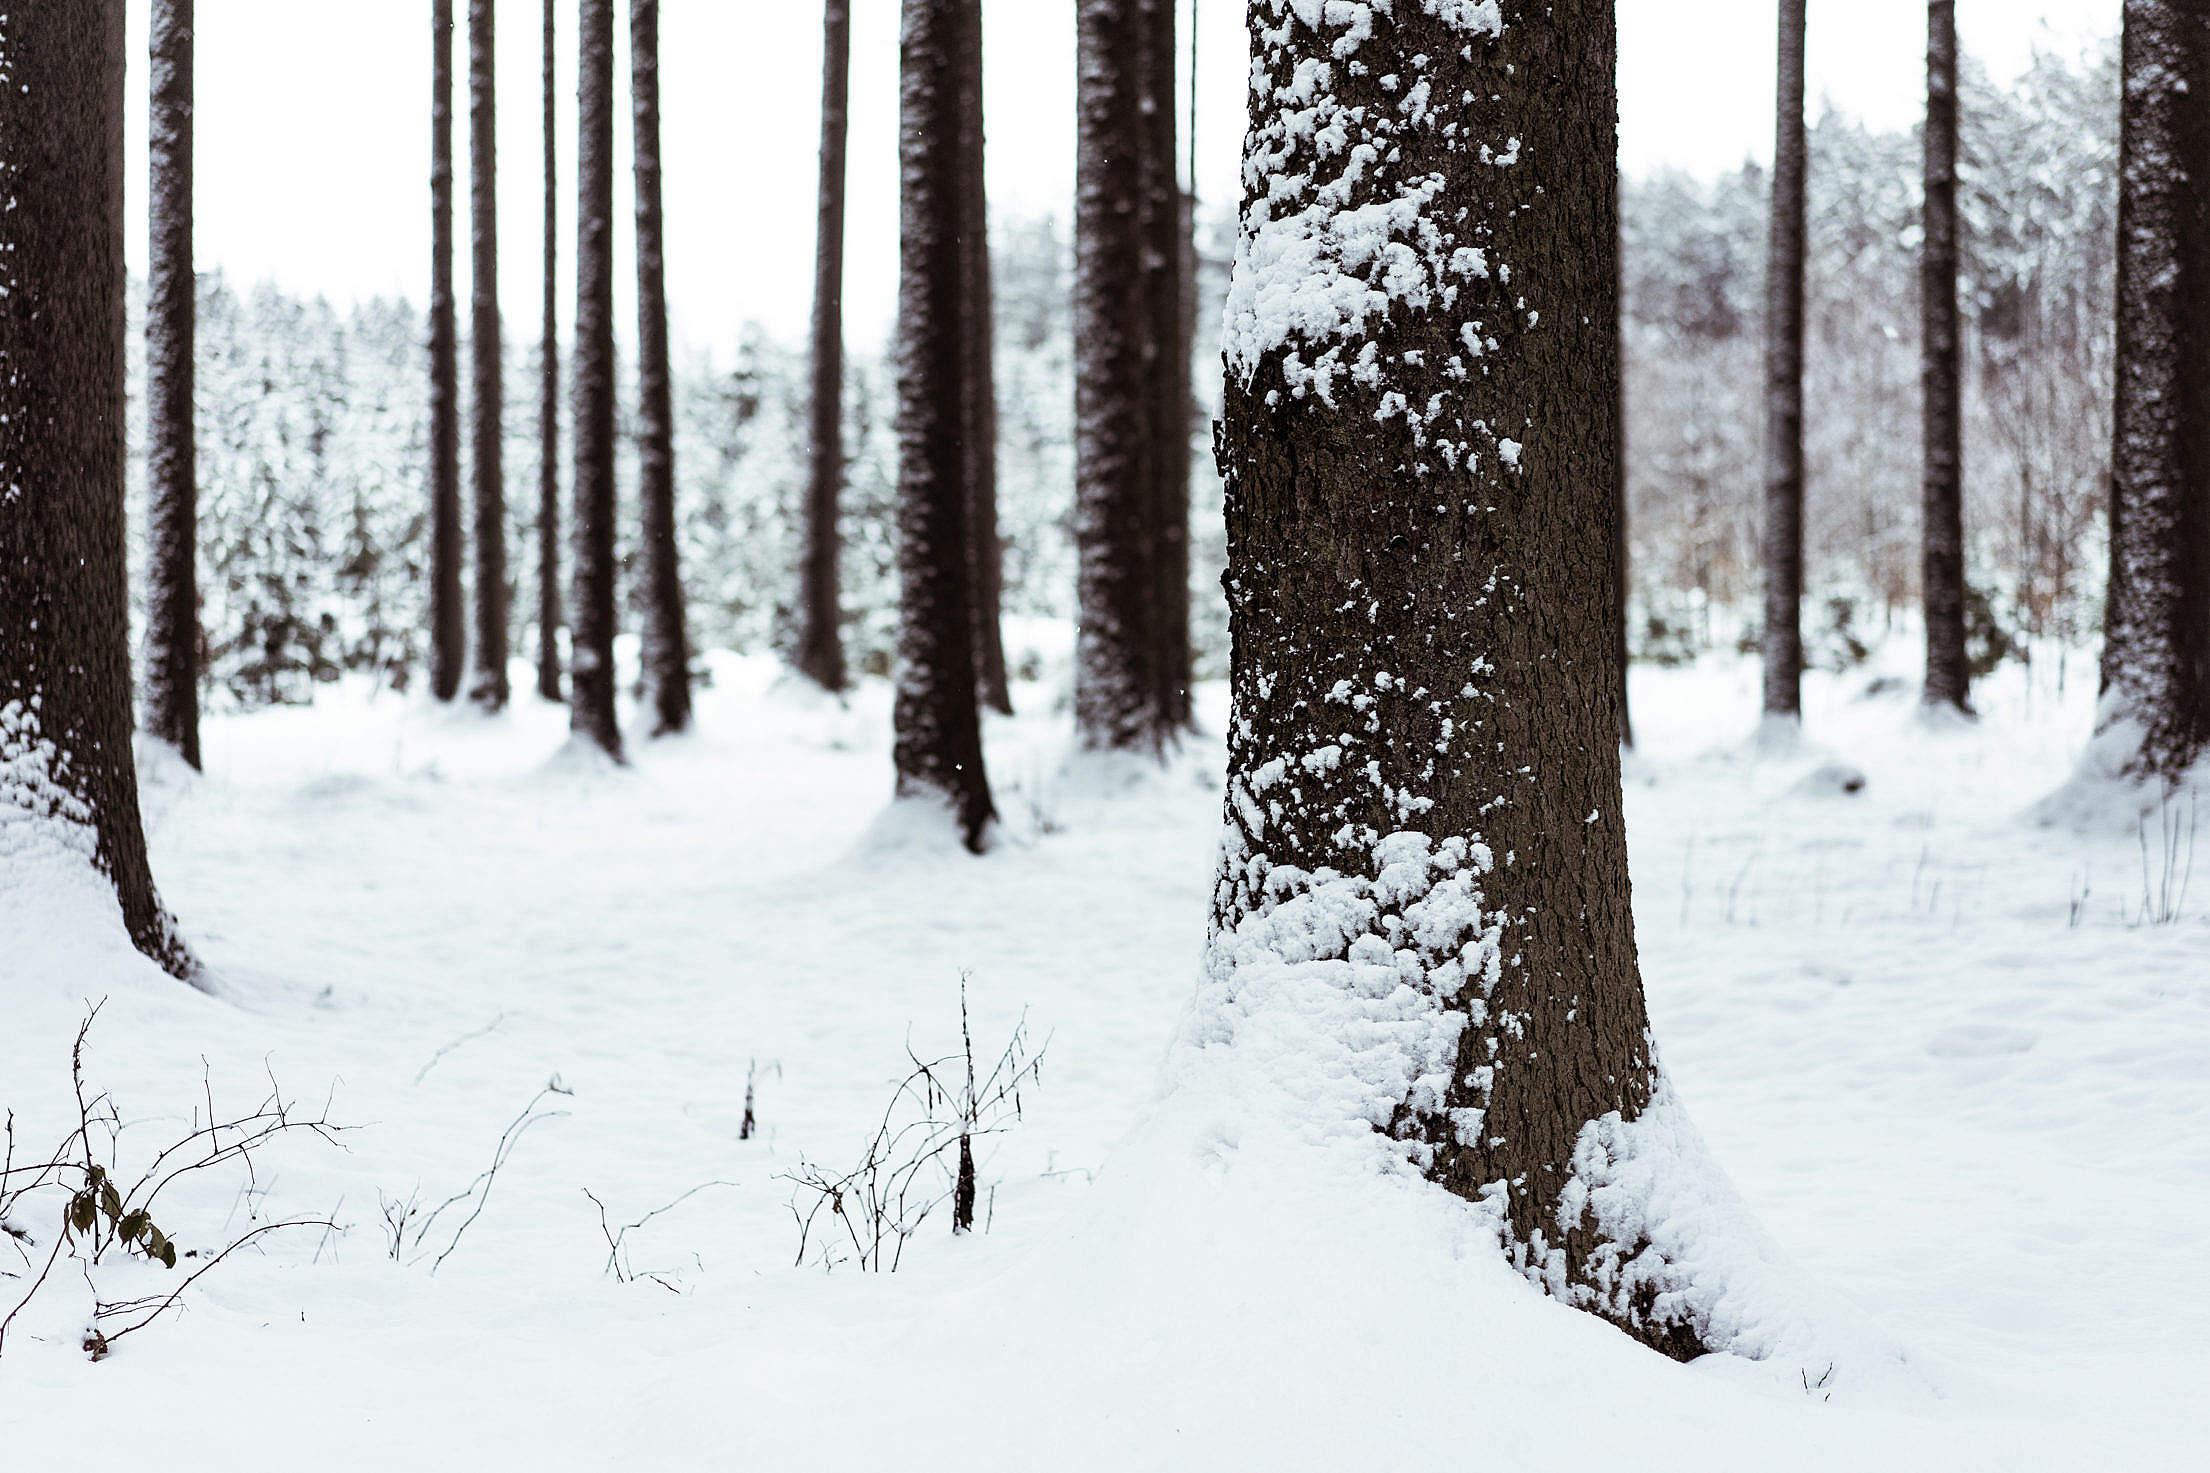 Snowy Tree Trunk Free Stock Photo